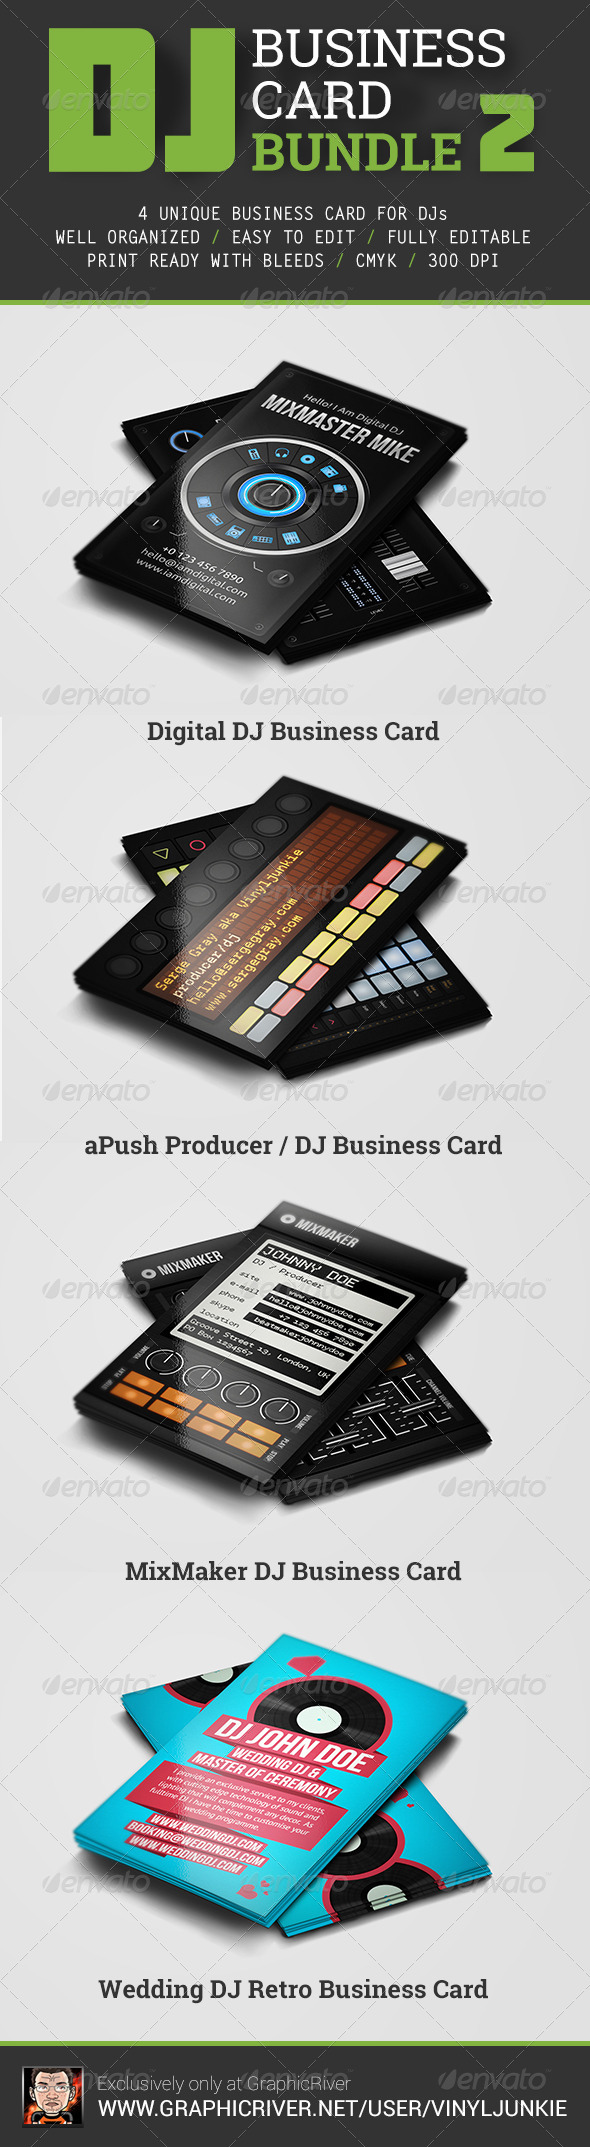 GraphicRiver DJ Business Card Bundle 2 6832896